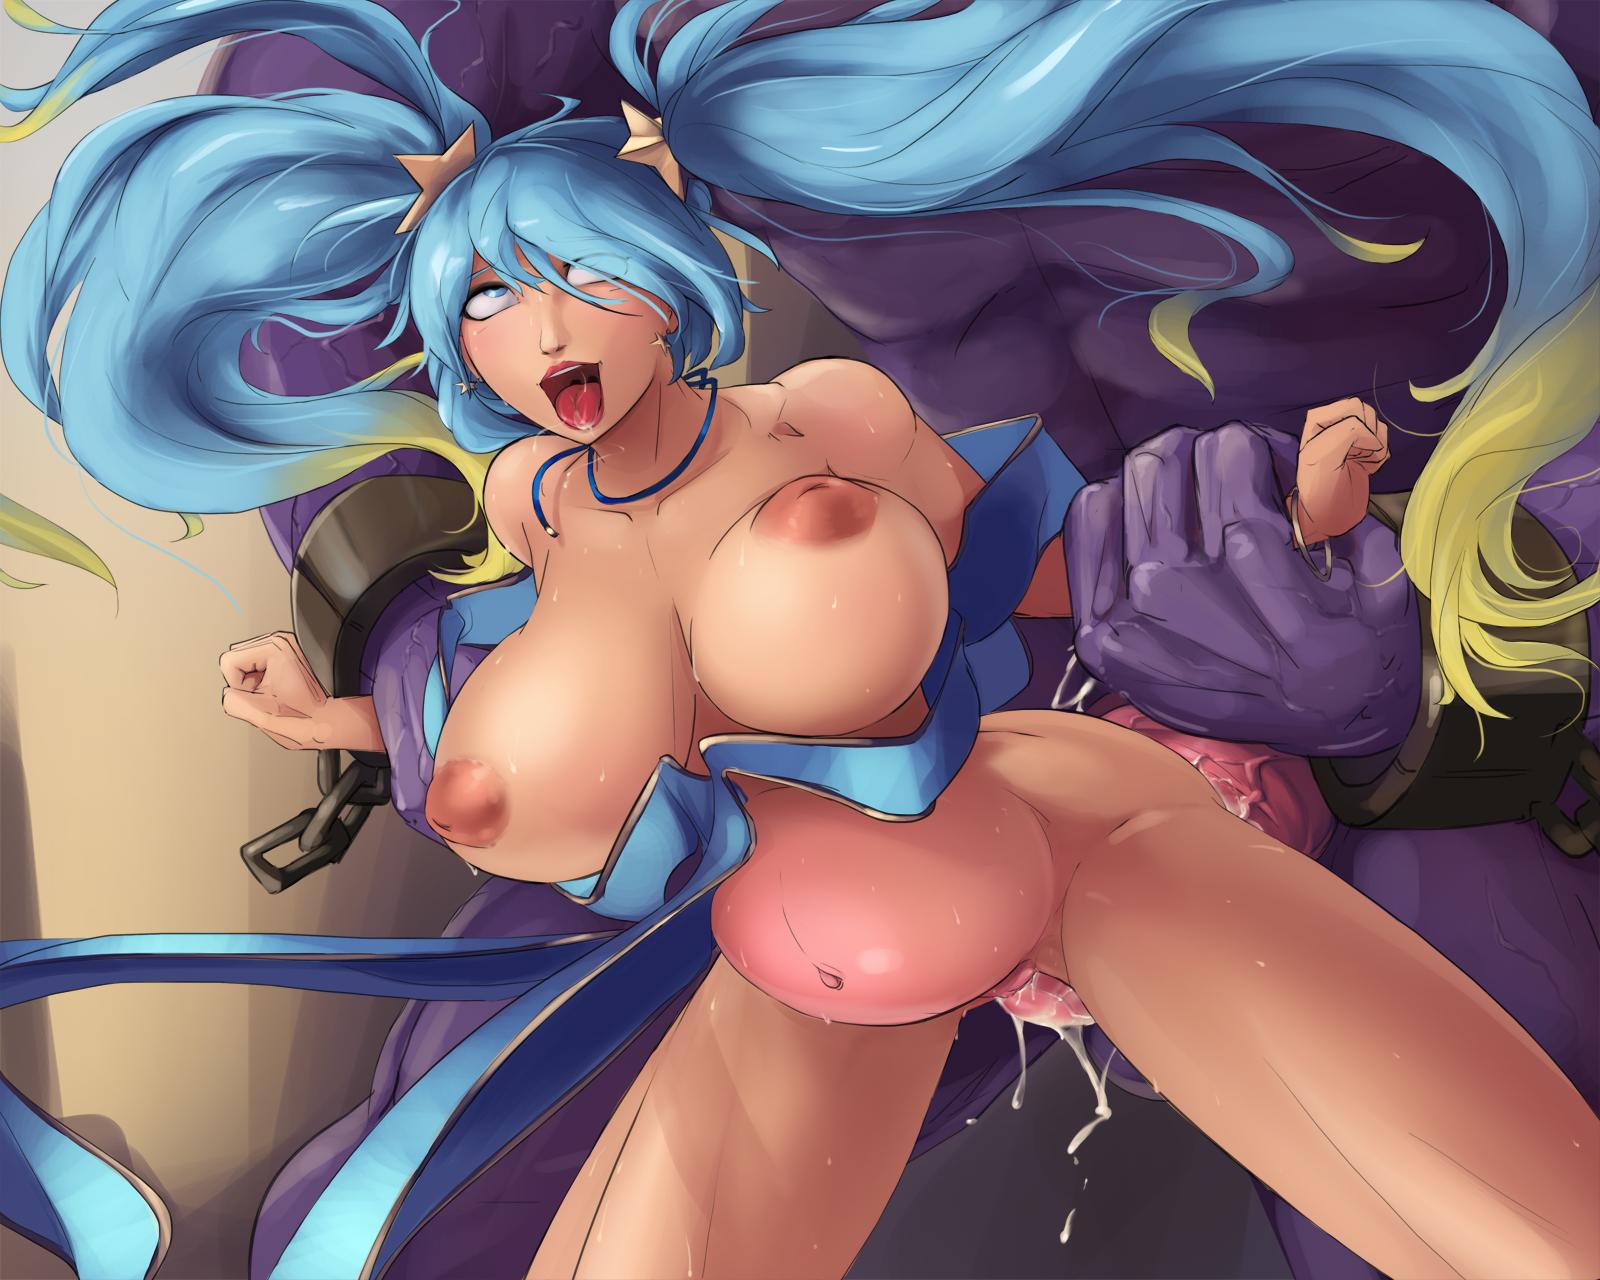 Alistar Porn alistar and sona | league of legends hentai - lol